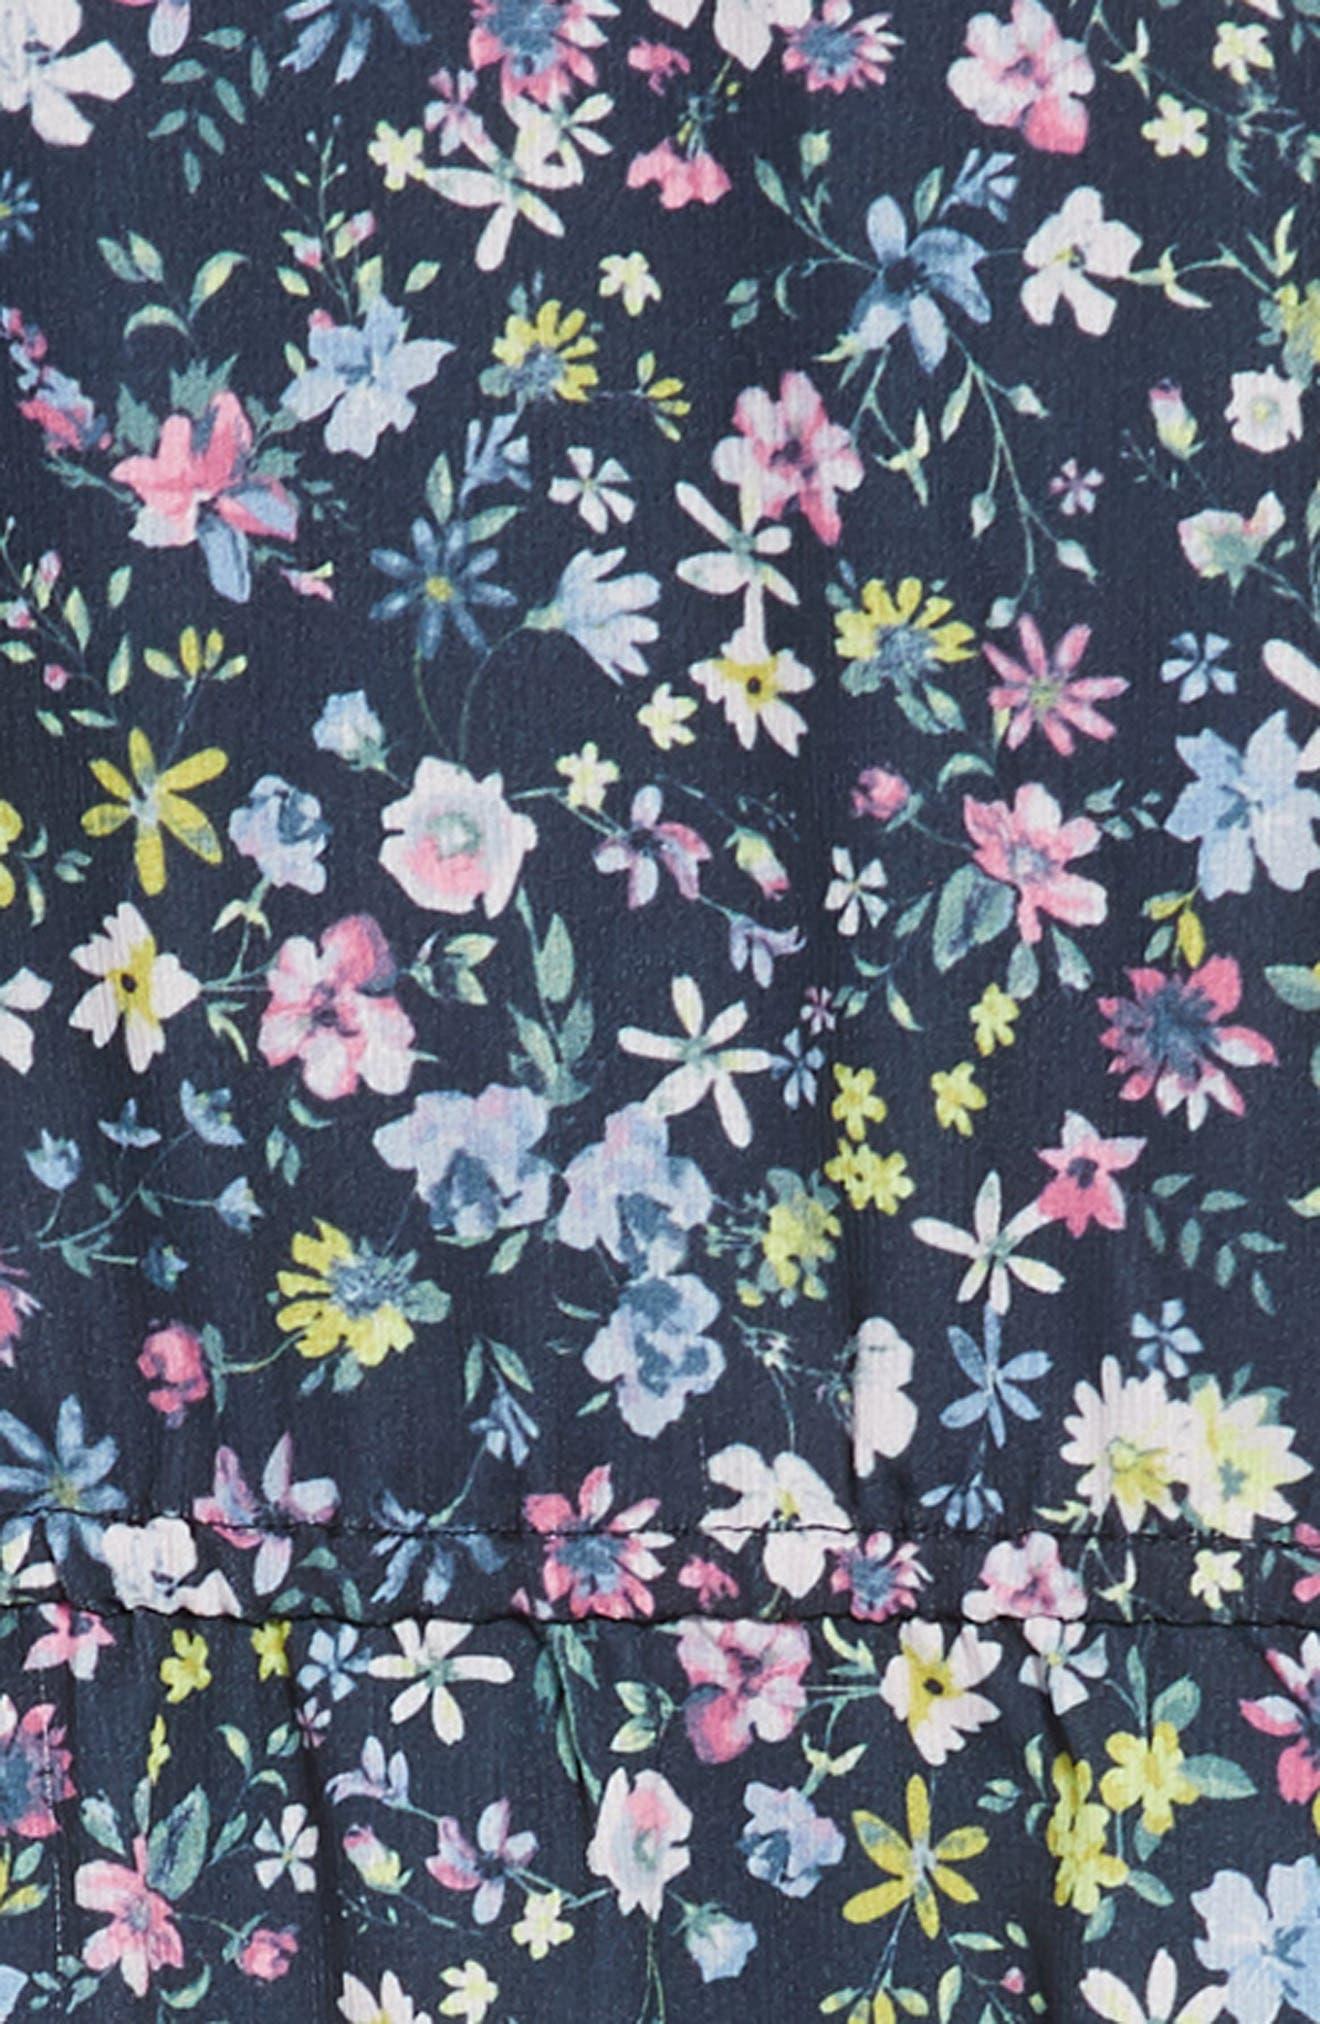 Ruffle Sleeve Floral Print Dress,                             Alternate thumbnail 2, color,                             Navy